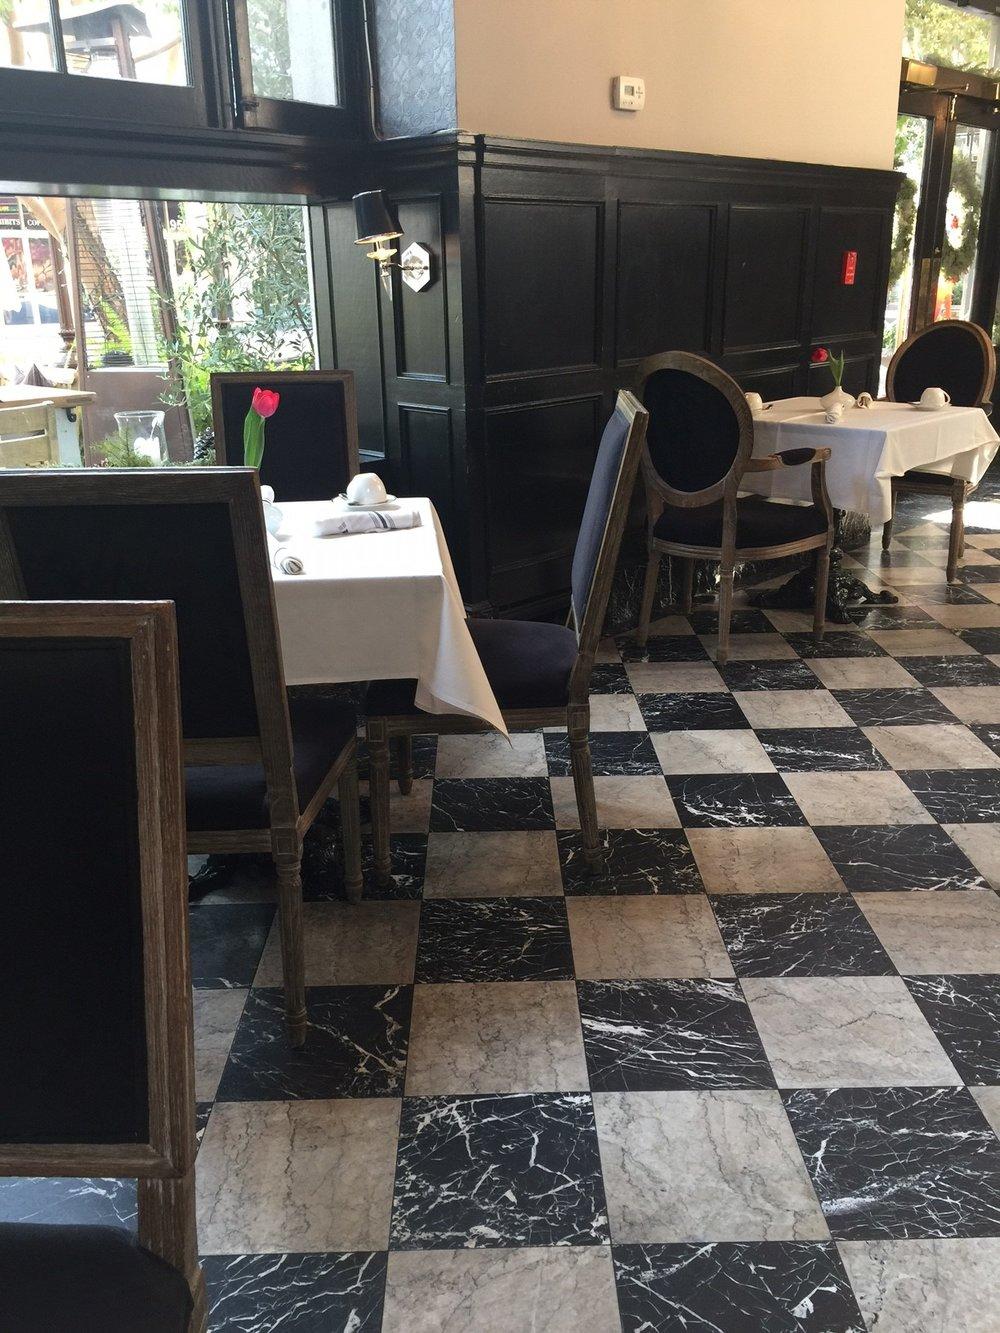 Marble checkerboard floor with black paneled walls - The Culver Hotel, Los Angeles